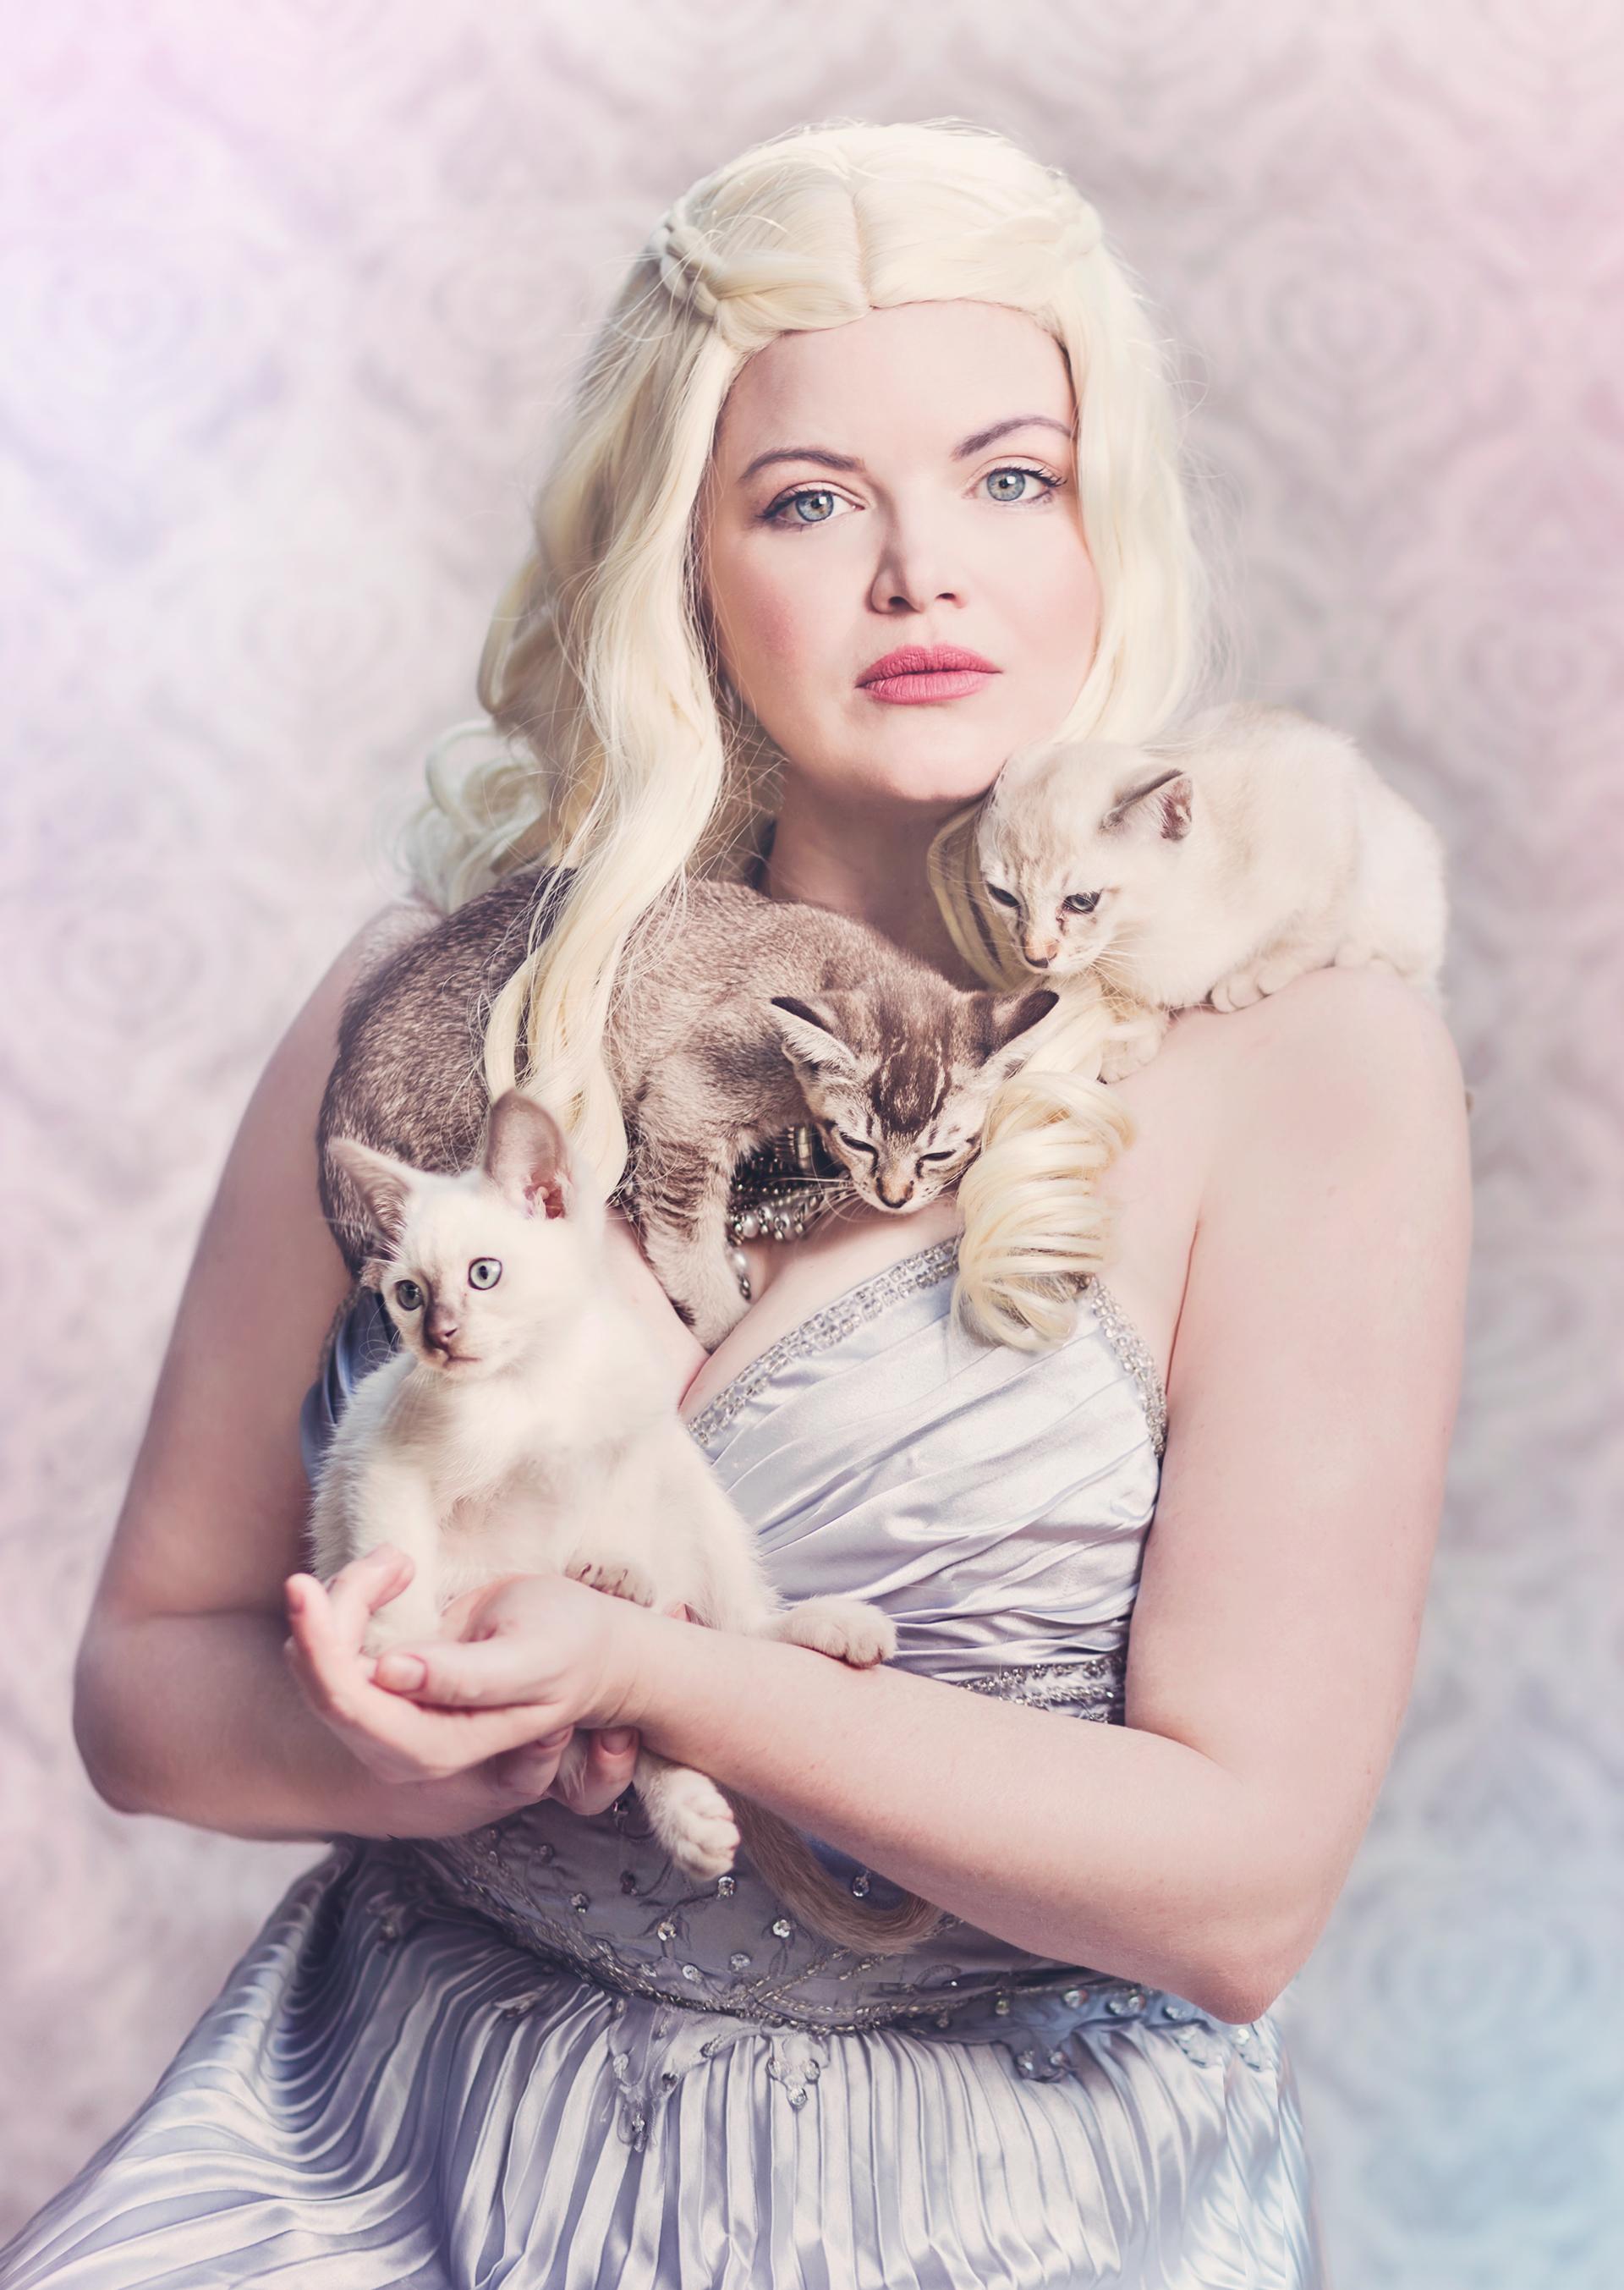 Image courtesy of the amazing Aurelie of  Whisper and Sing Photography .